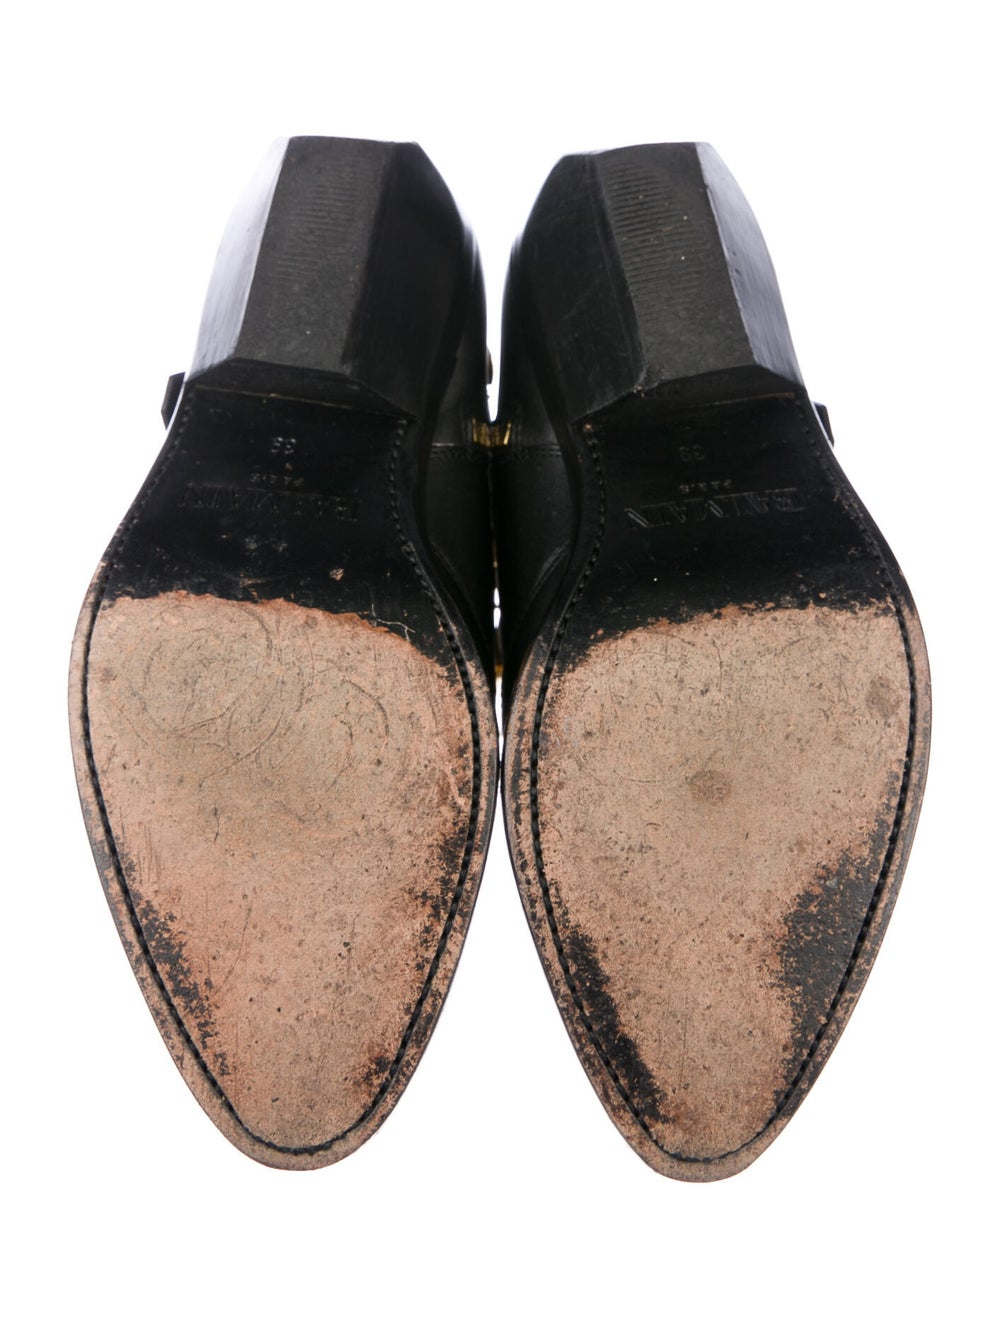 Balmain Leather Western Boots Black - image 5